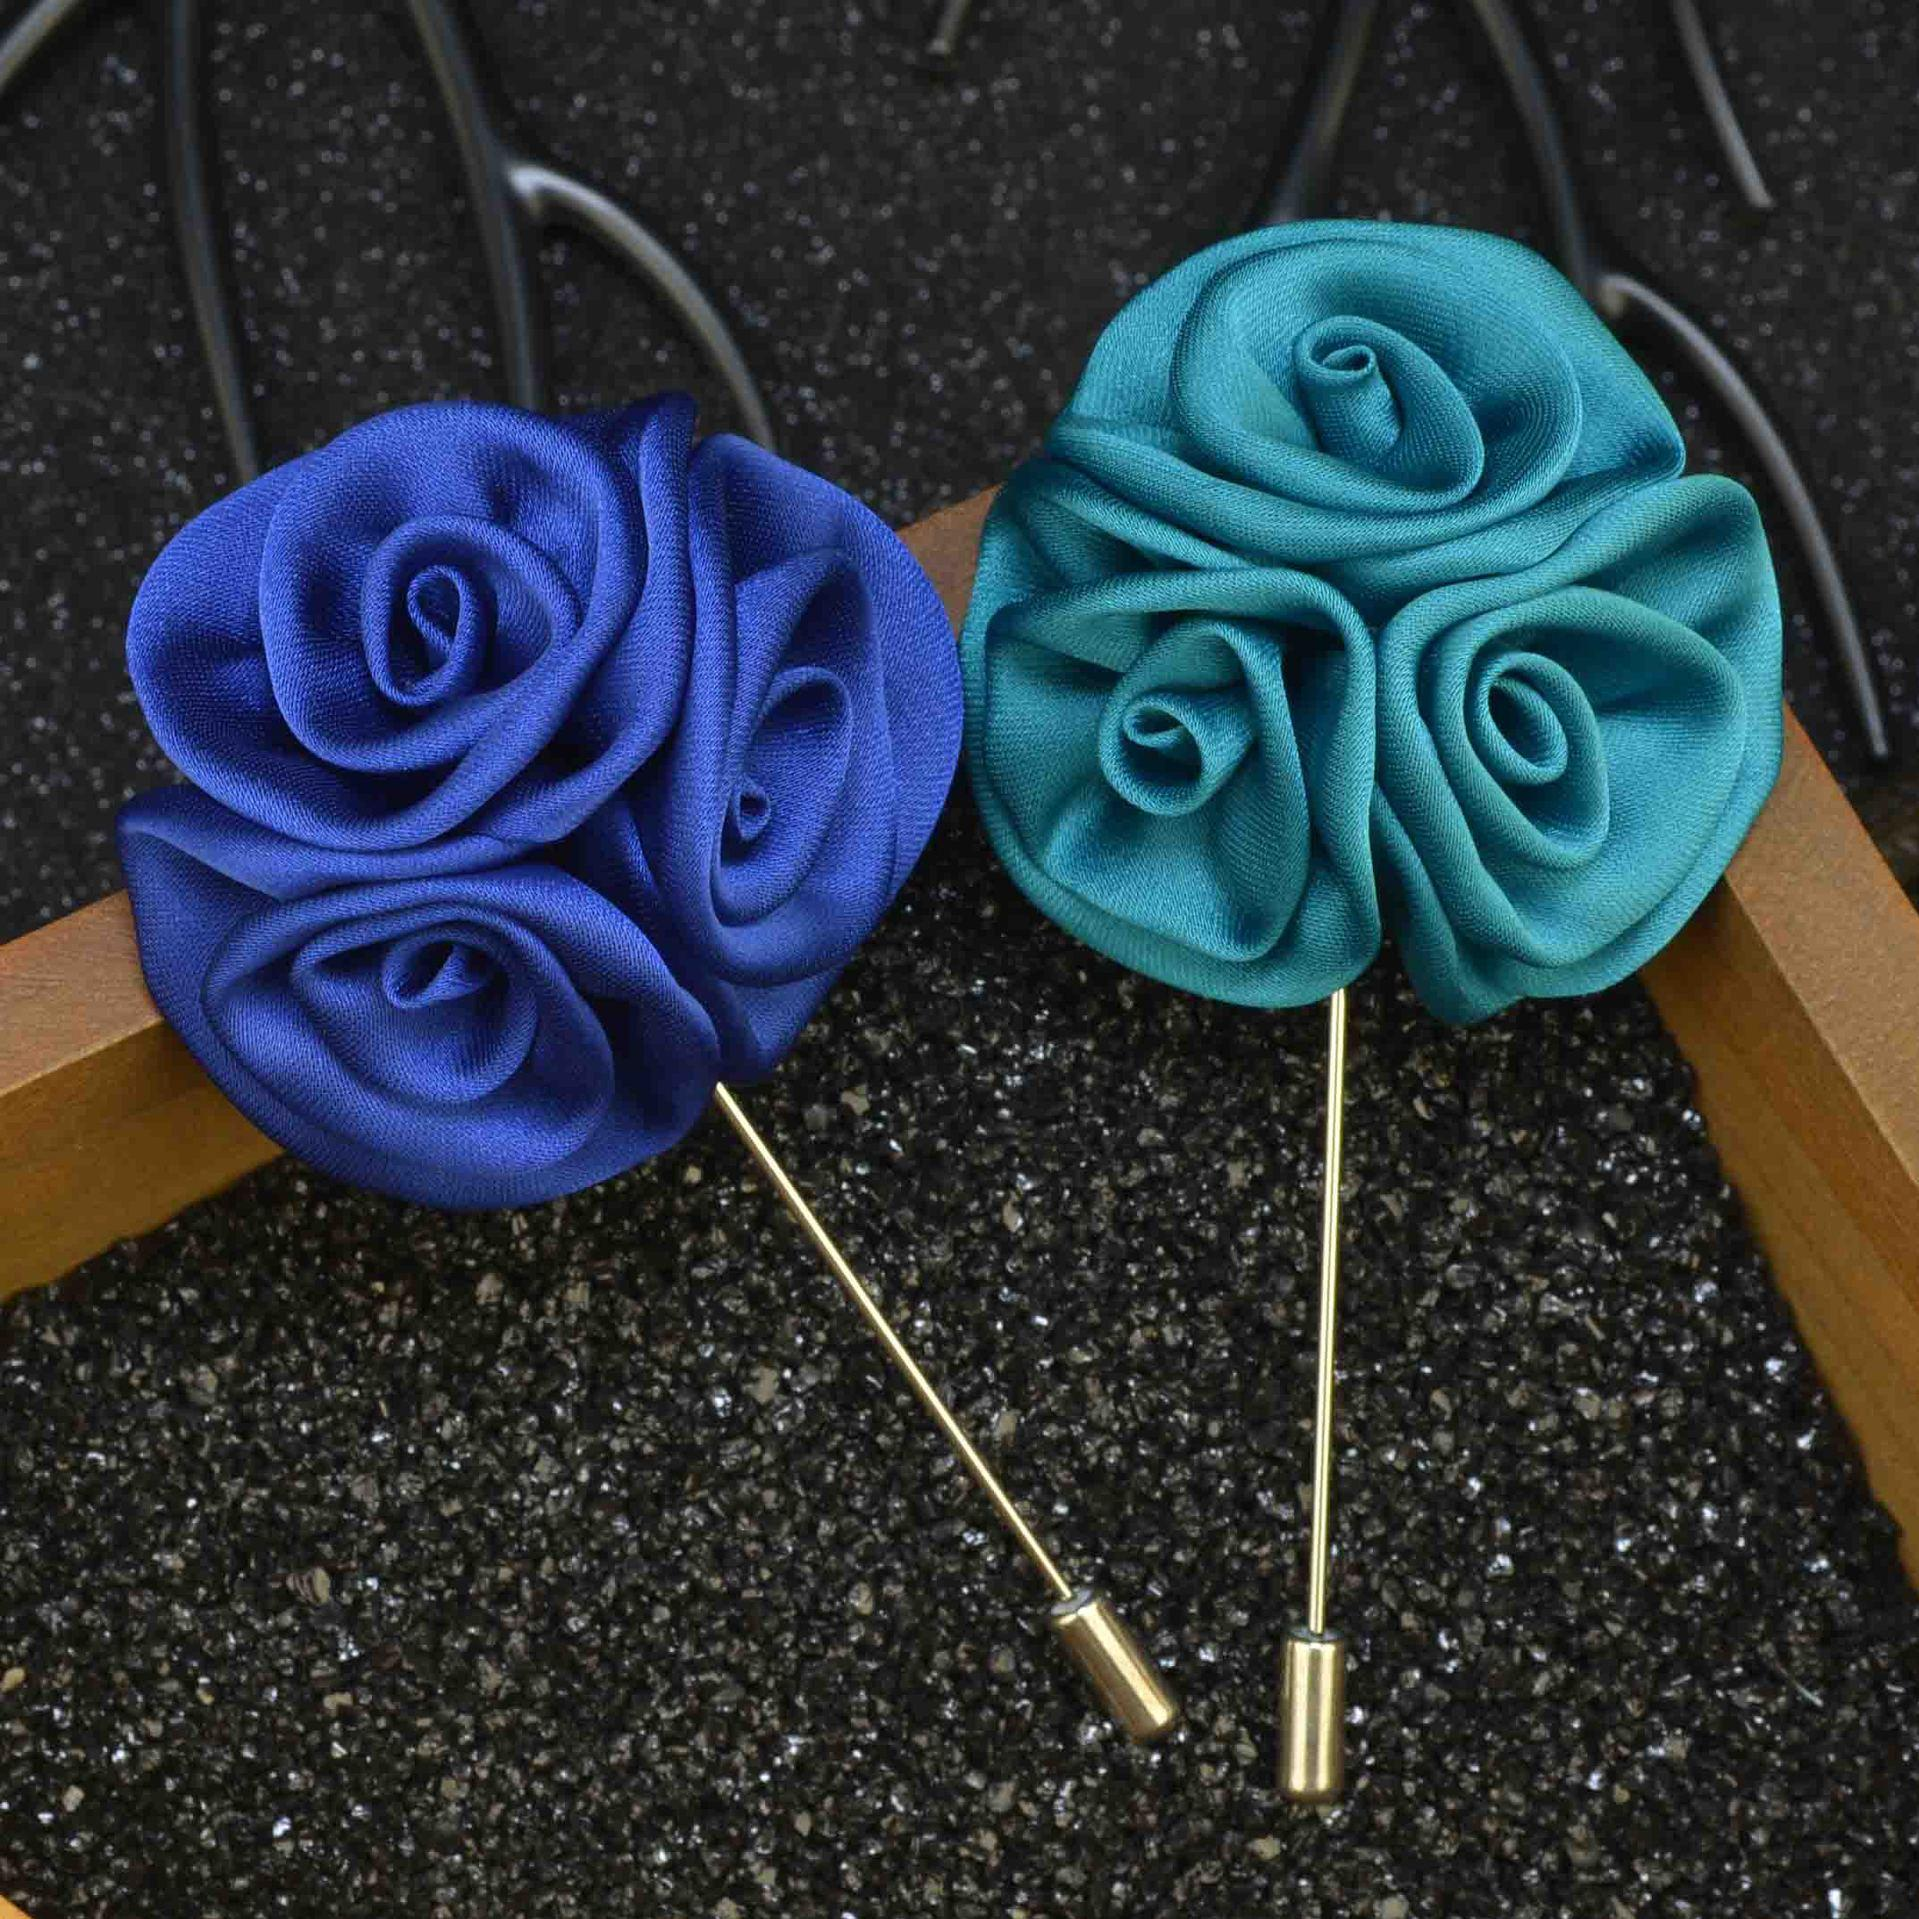 2018 2017 Silk Rose Flowers Brooch Lapel Pins Fashion Handmade